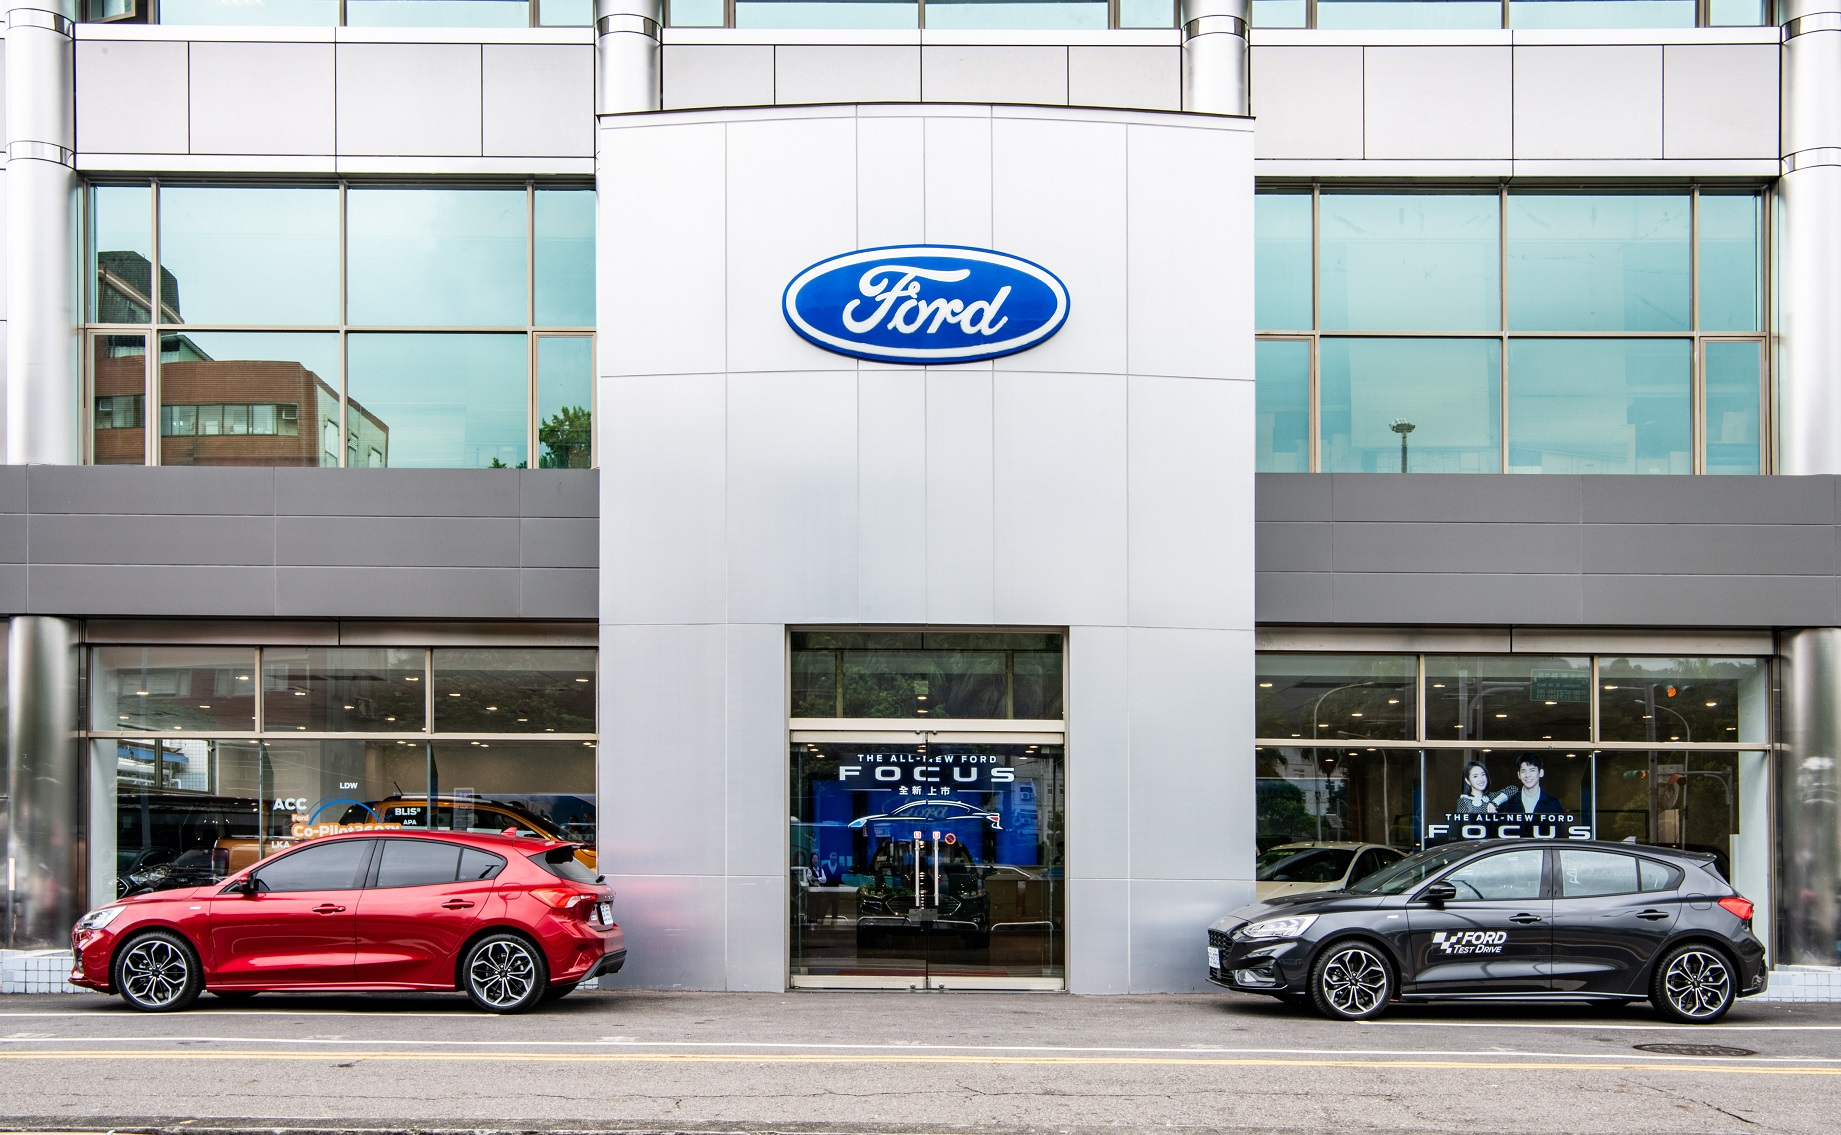 Ford6.JPG